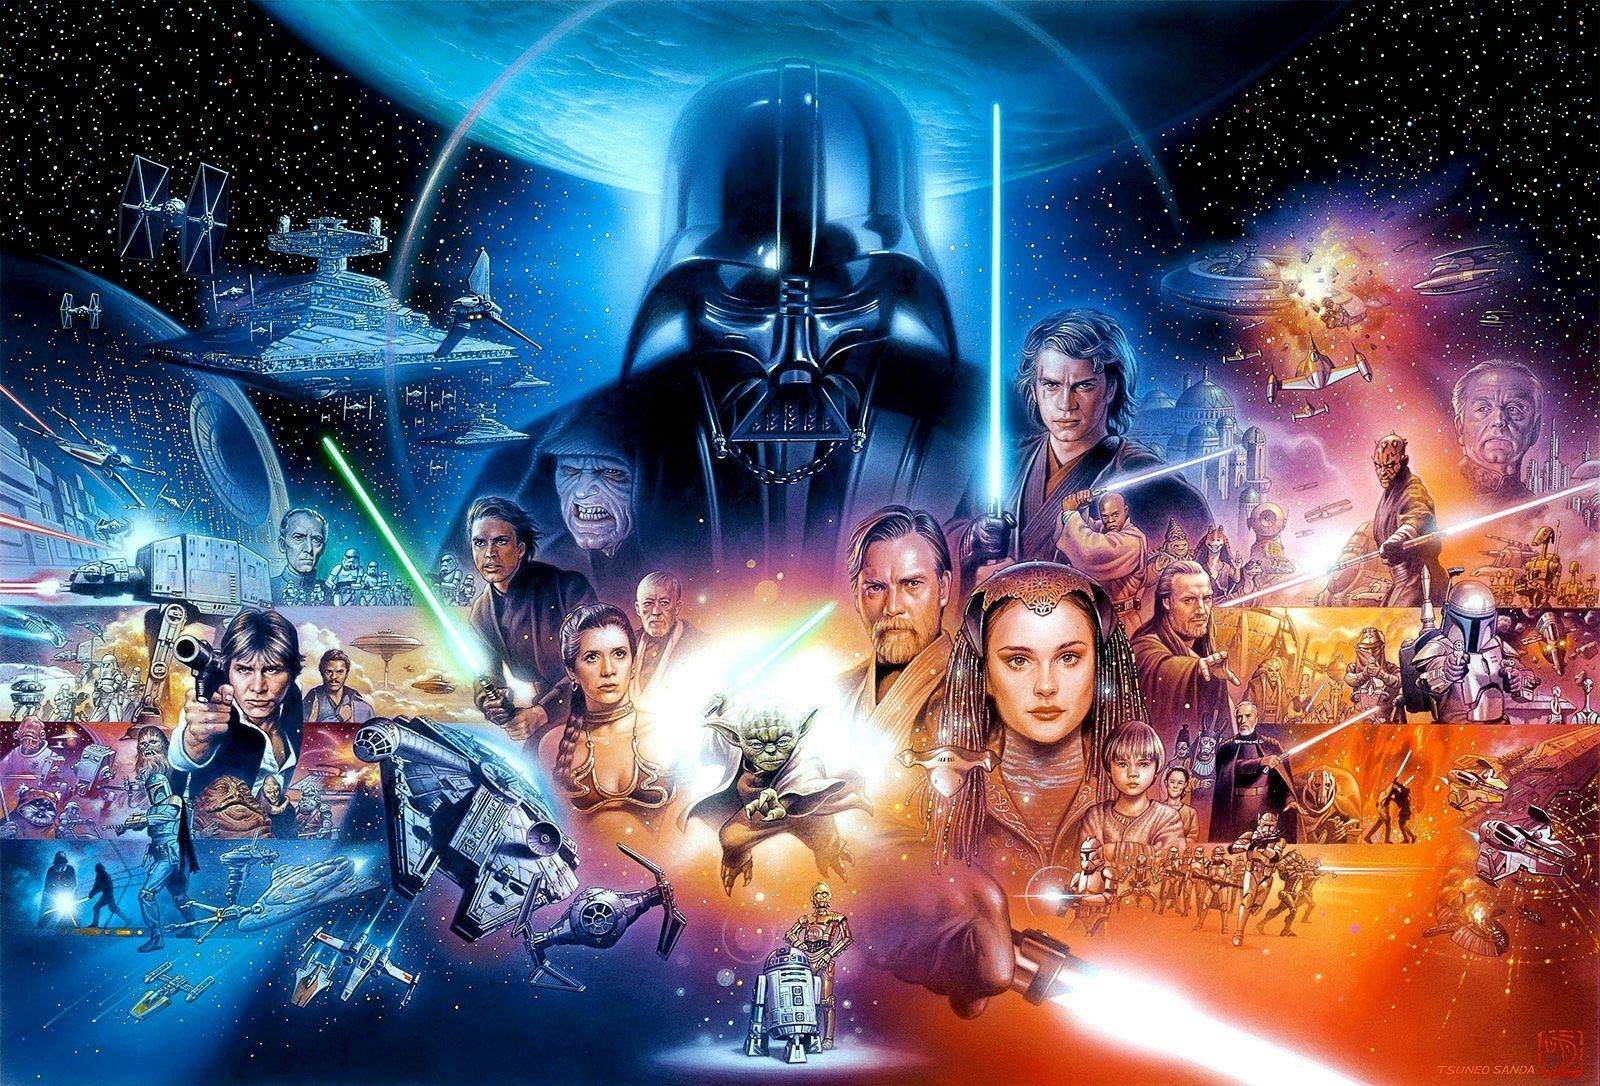 star wars wallpaper - bdfjade